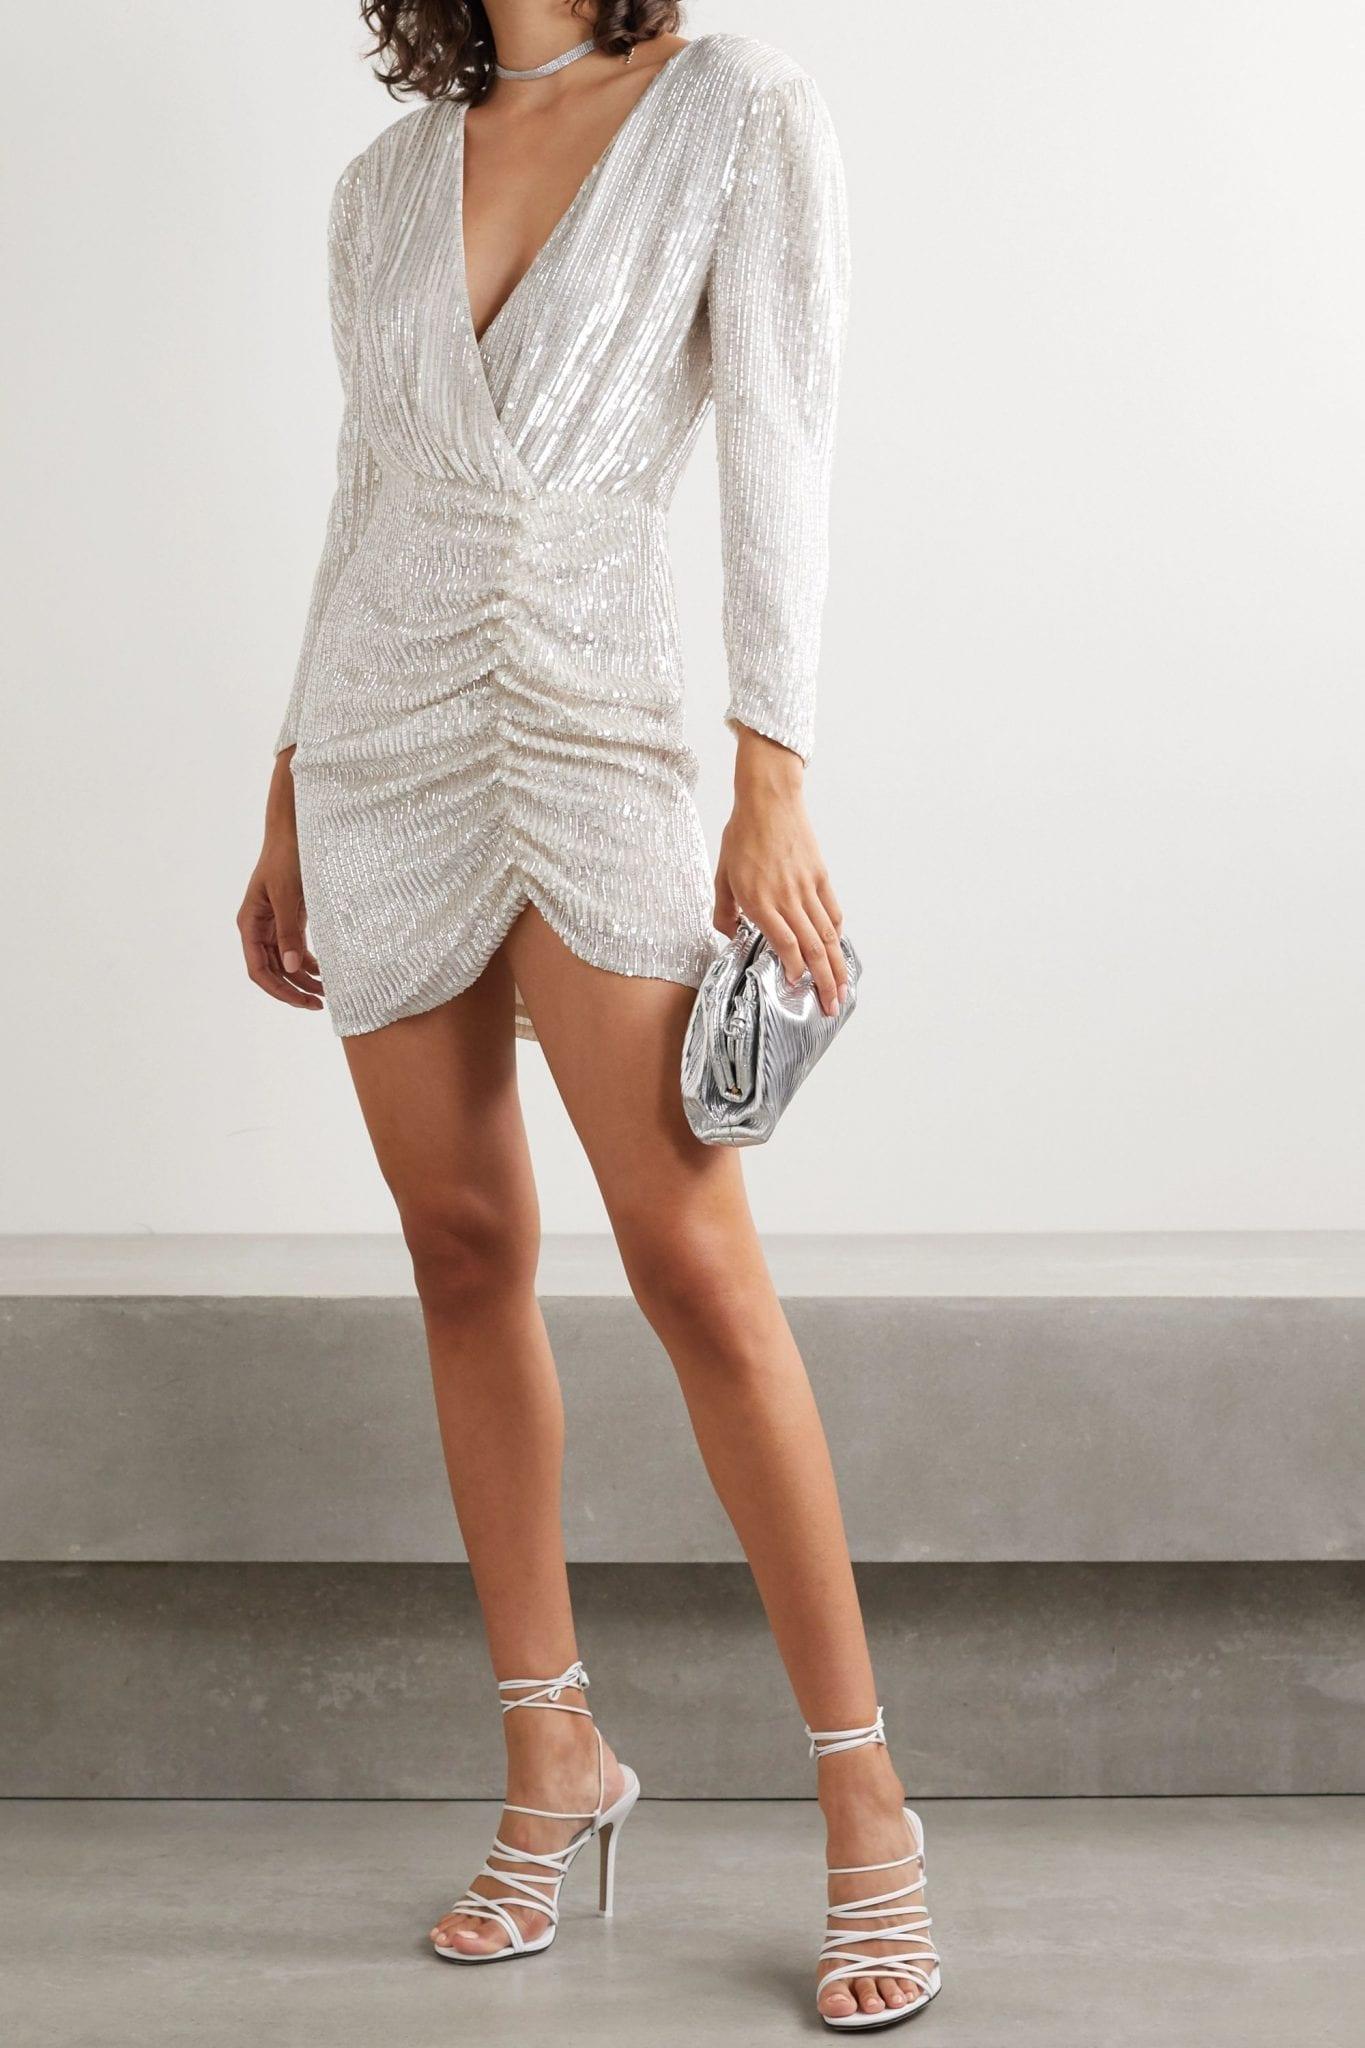 RETROFÊTE Stacey Gathered Embellished Chiffon Mini Dress